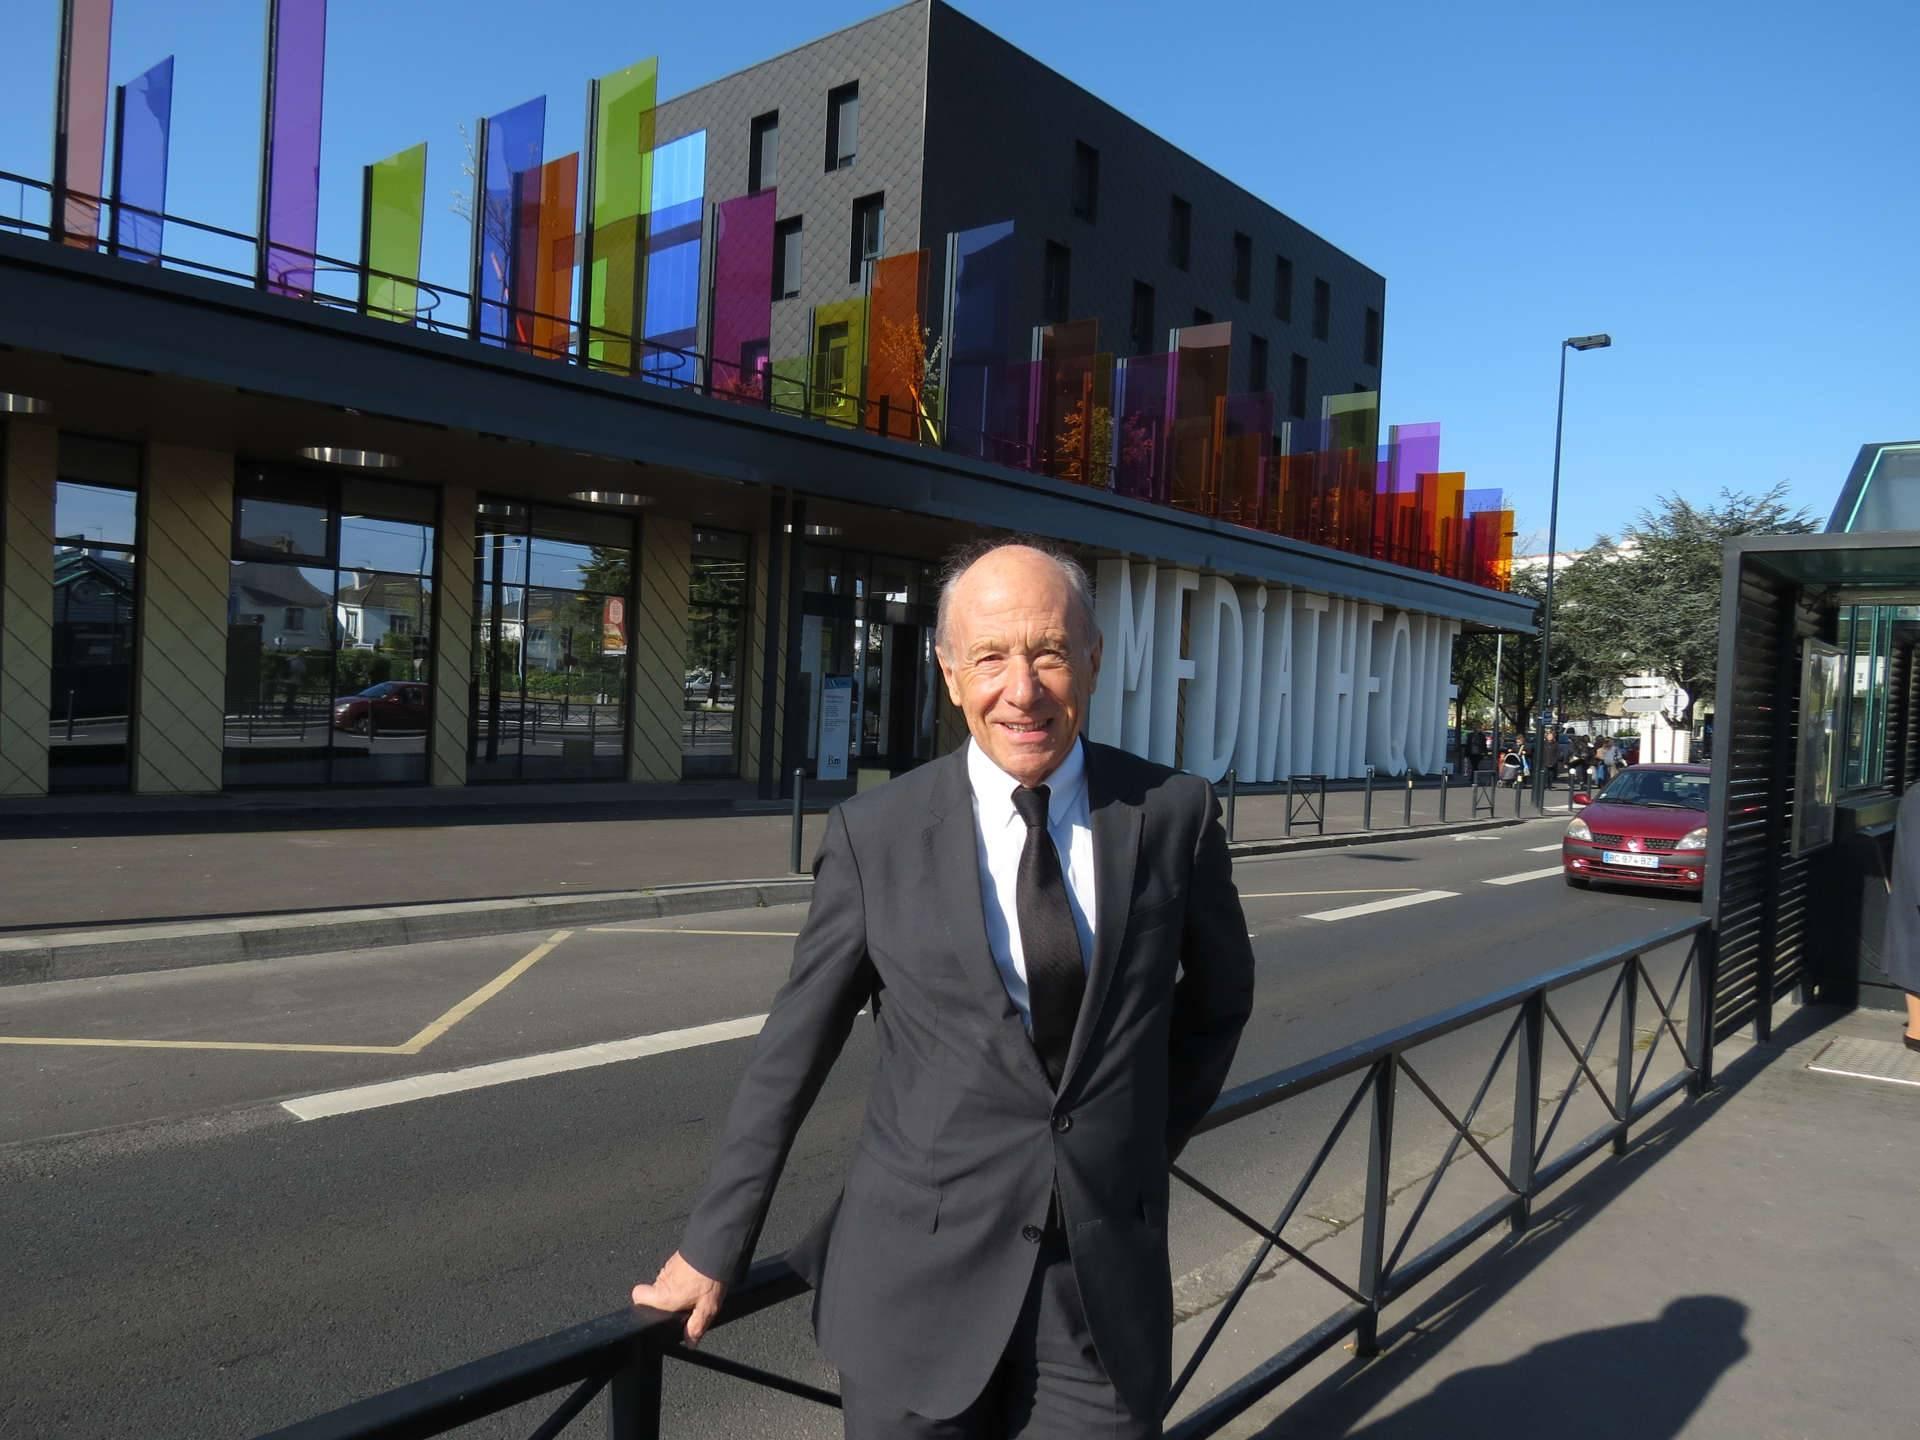 Gilbert Caharel devant la résidence Villamédia à Nantes